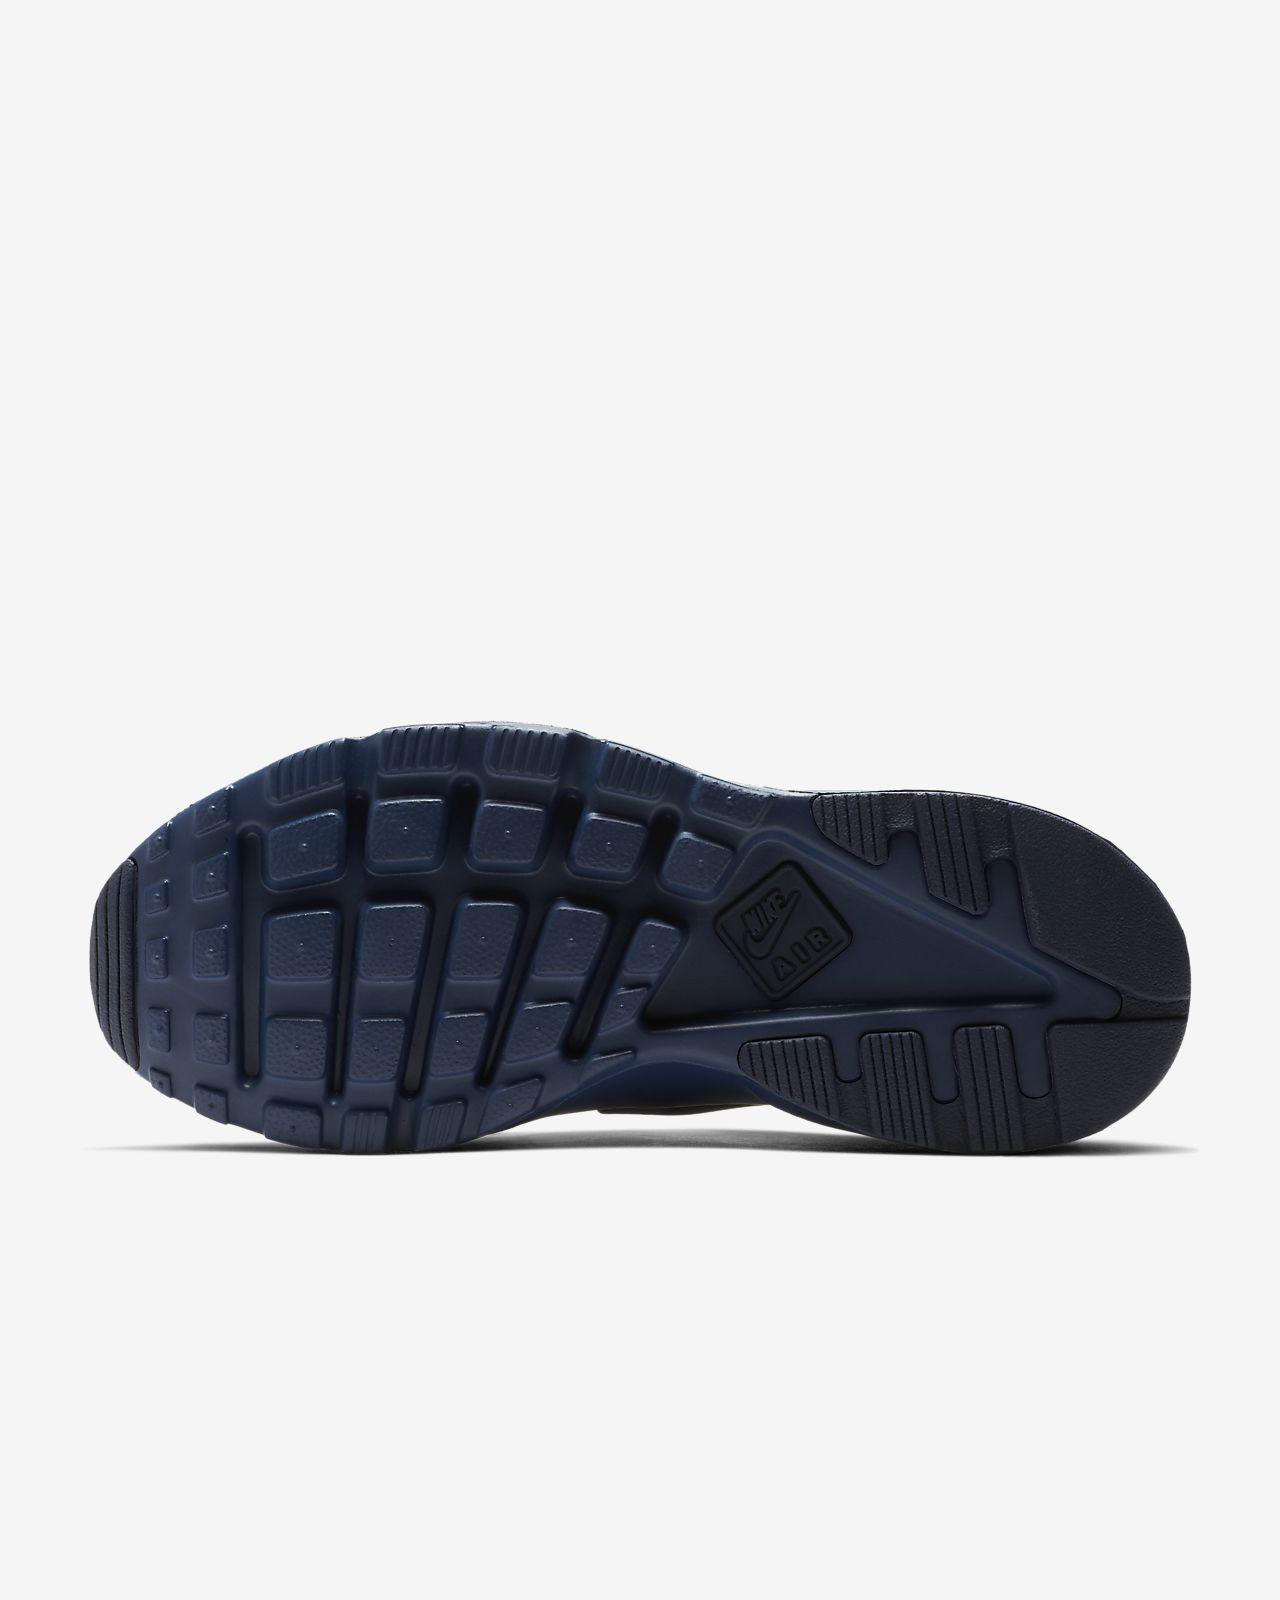 fbacfdbf4546a Nike Air Huarache Ultra Men s Shoe. Nike.com AT